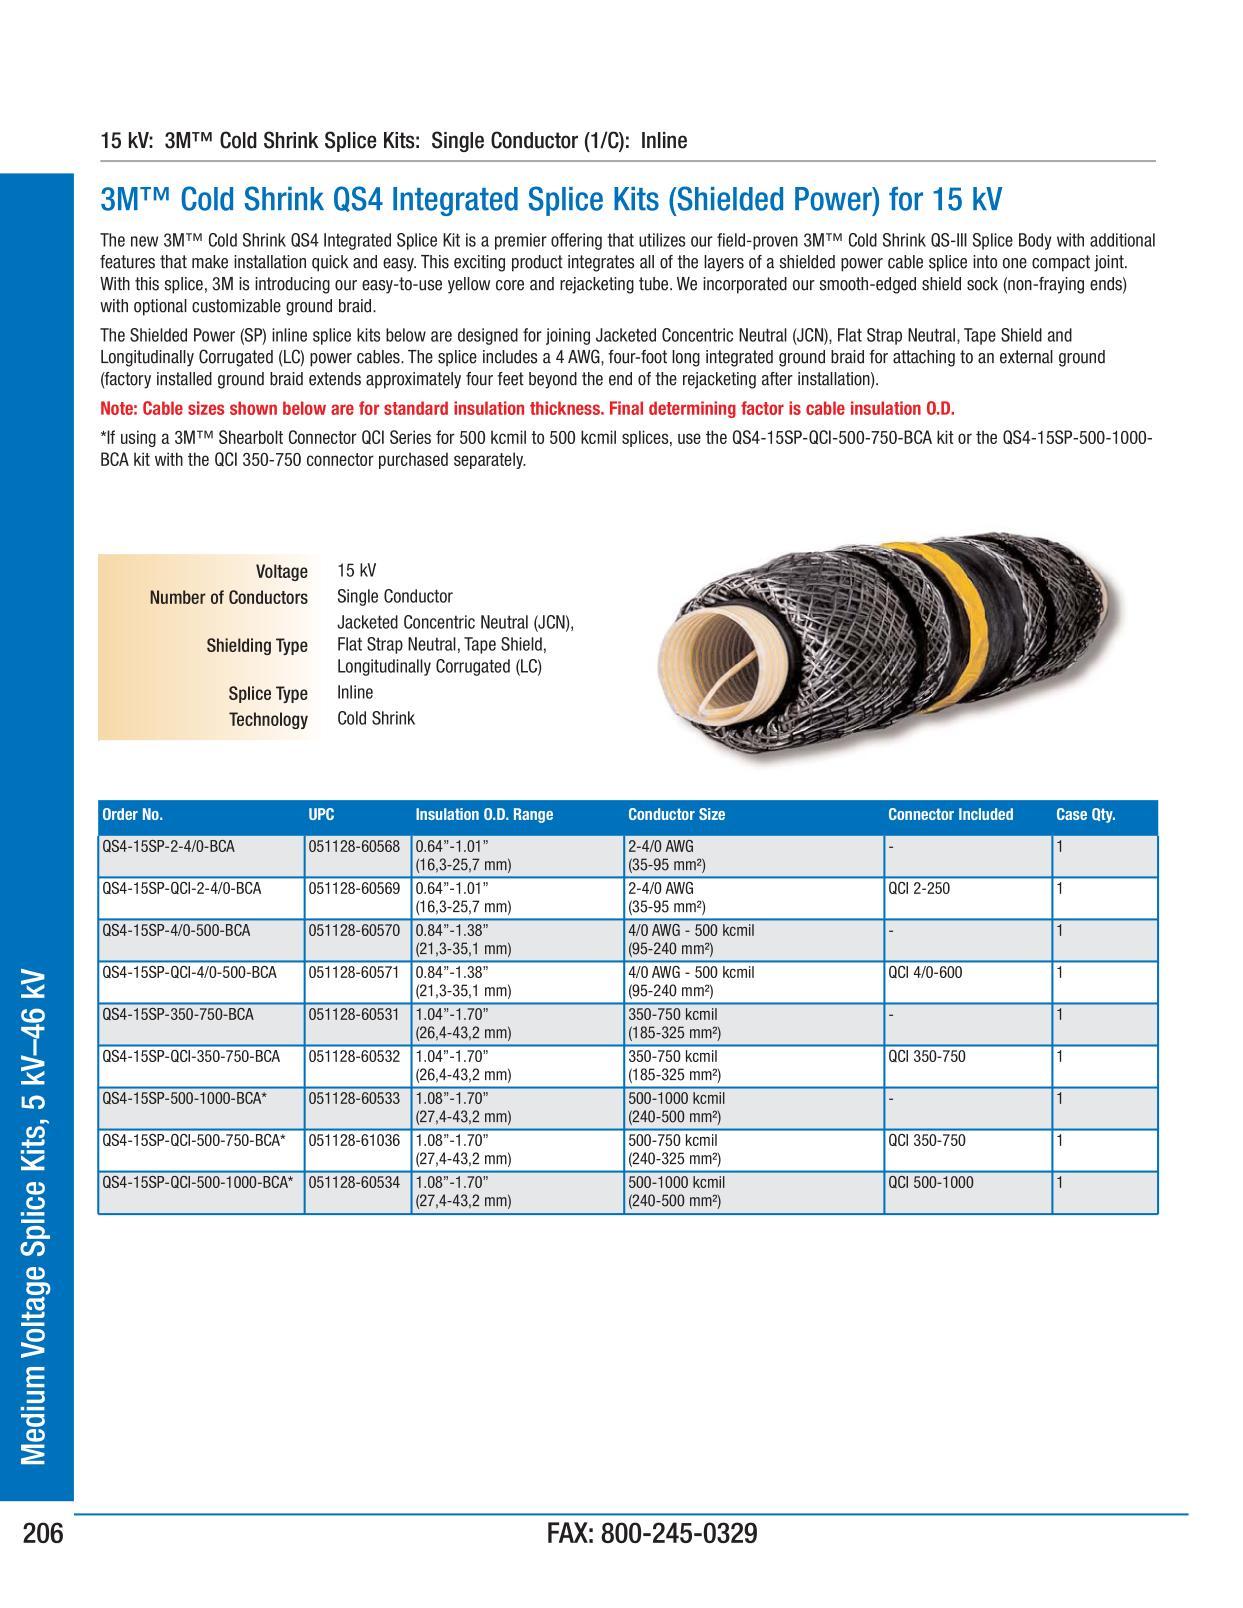 Medium voltage splice kits 5 kv 46 kv 3m big deal promotion page 205 videos greentooth Image collections